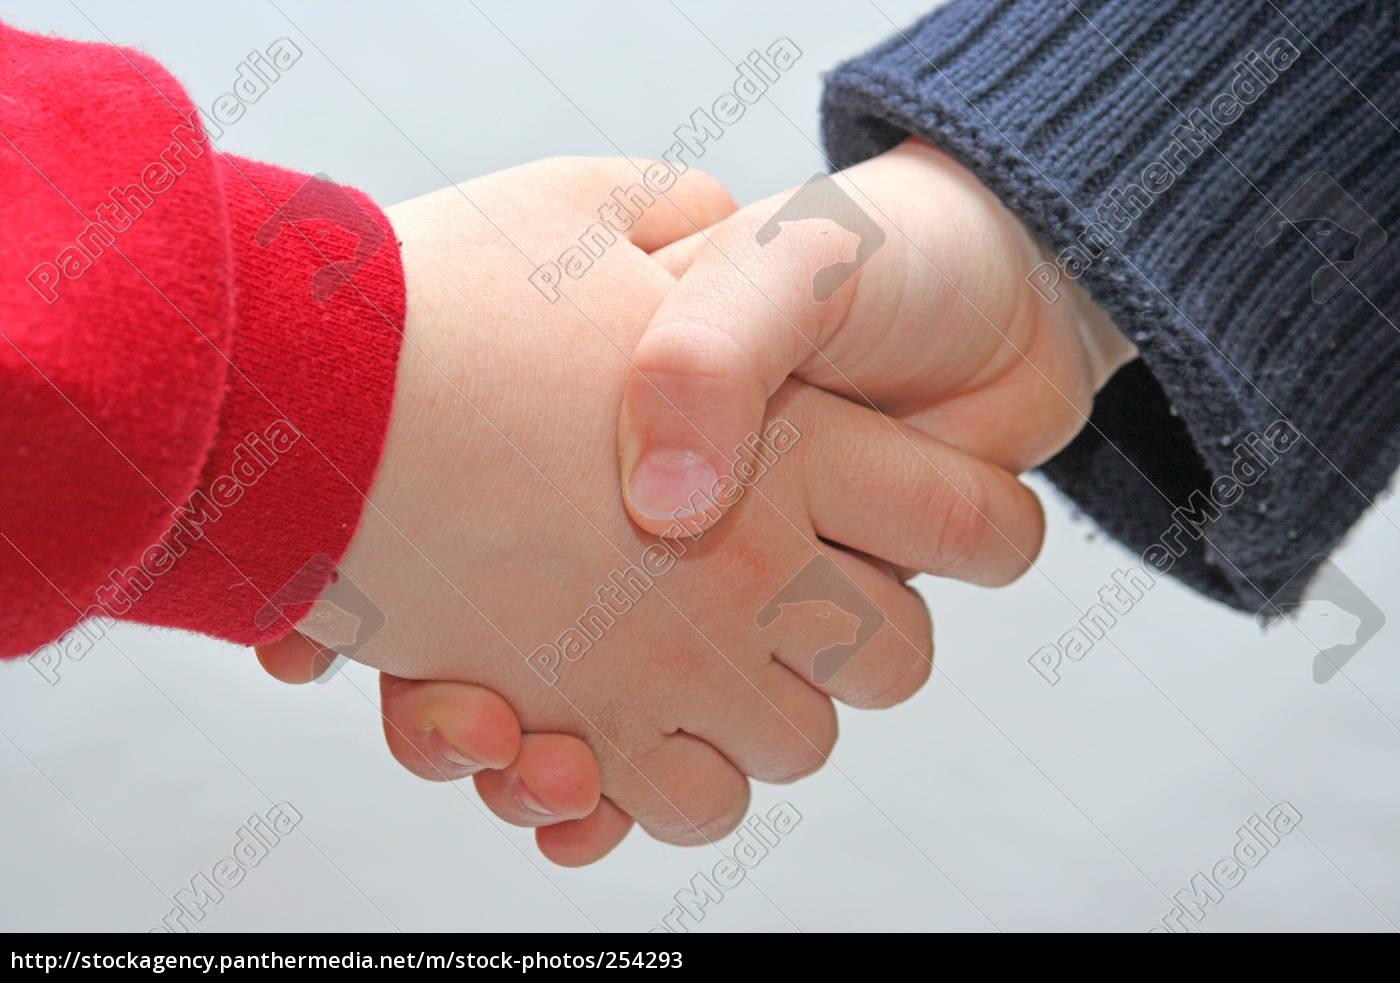 children, handshake - 254293